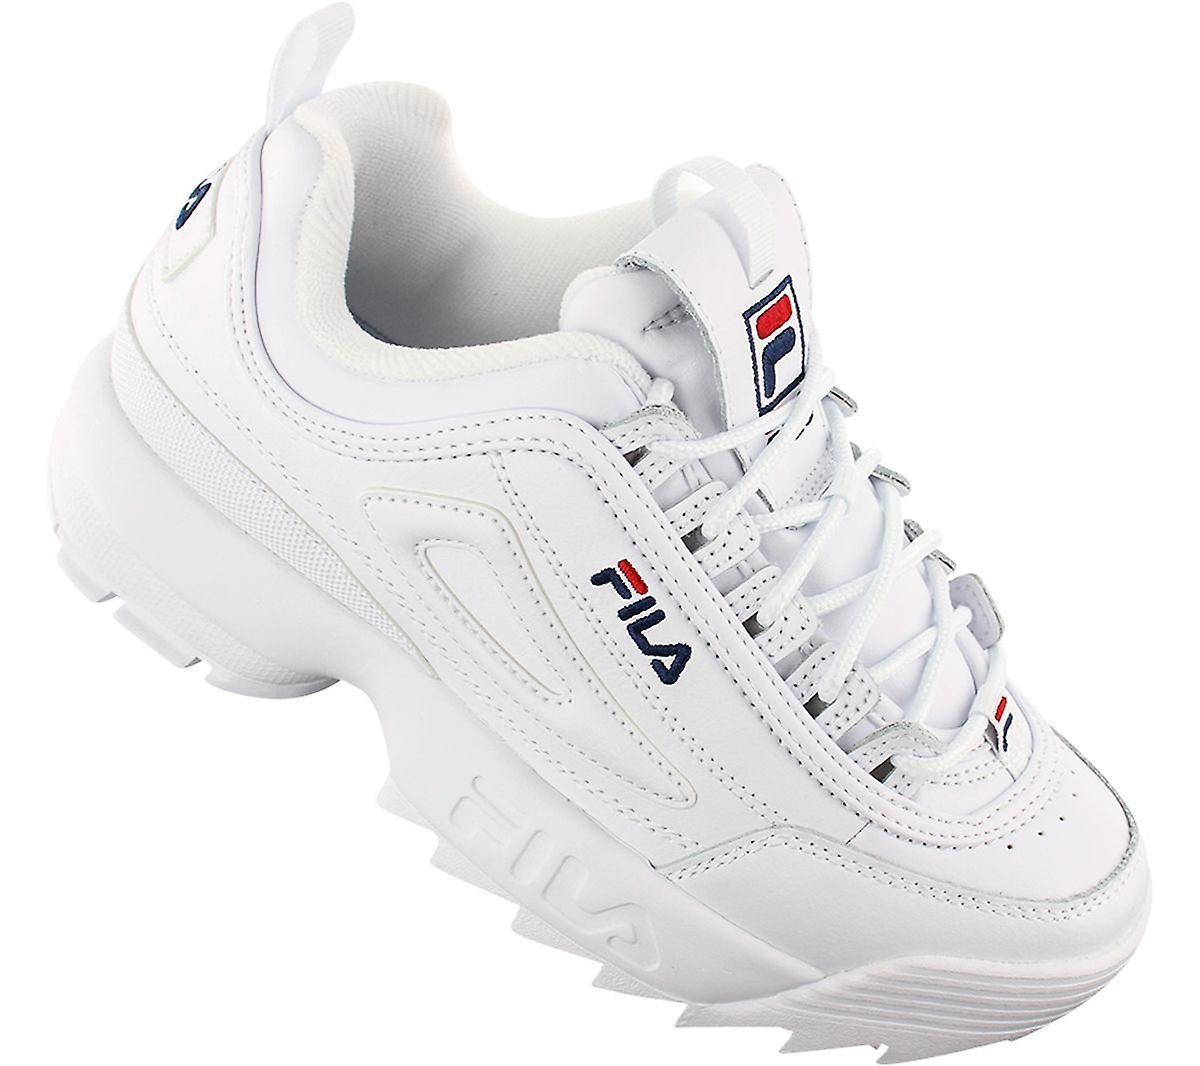 FILA Disruptor 2 Premium 5FM00002-125 - Damen Schuhe Weiß Sneakers Sportschuhe - Gratis verzending hMsbdO